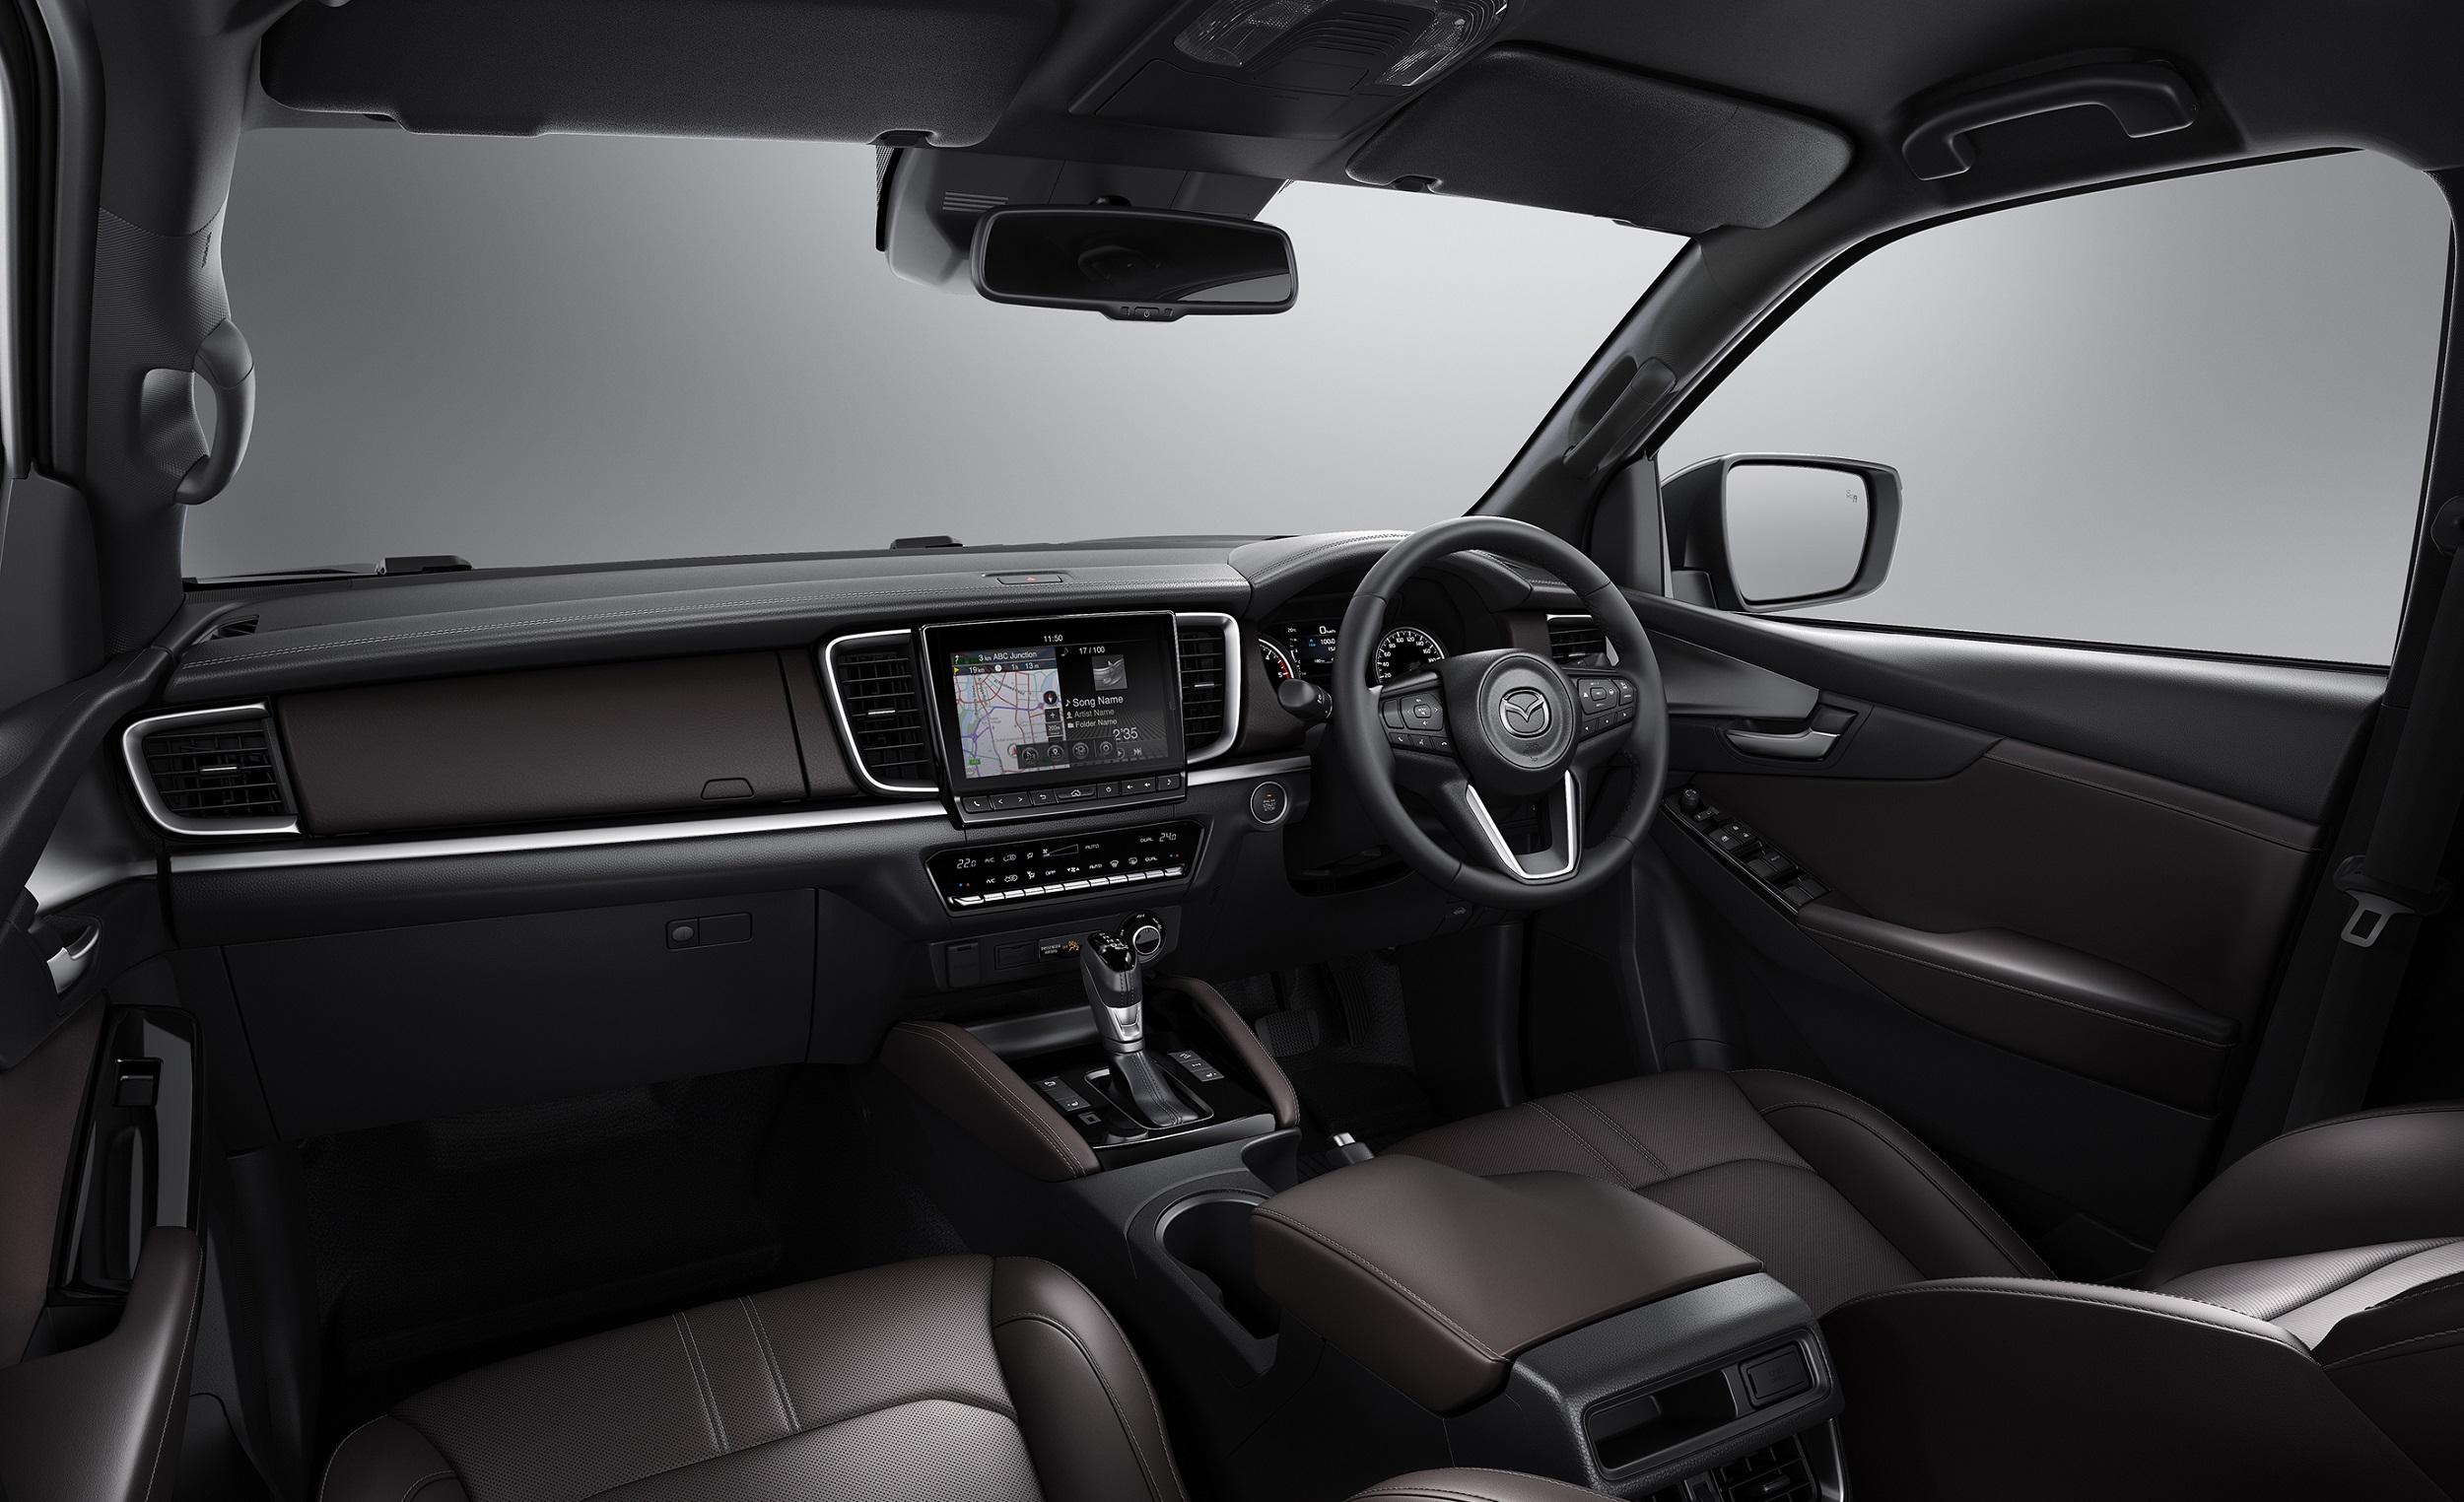 Mazda BT-50 truck interior